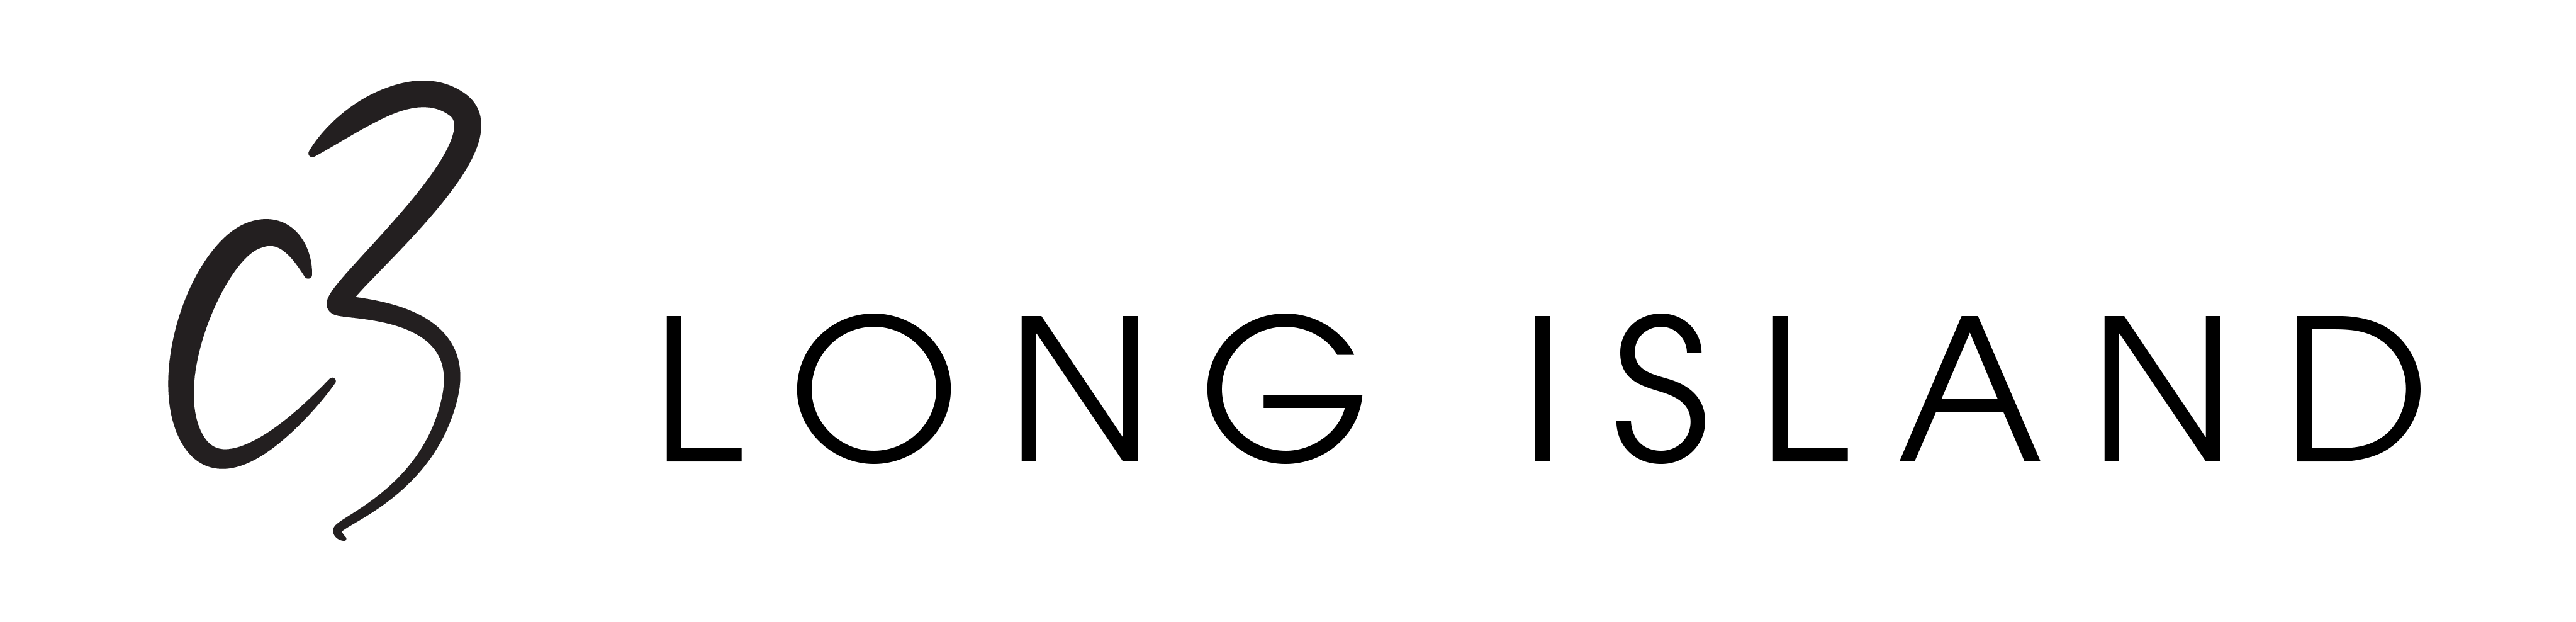 Peter Irvine logo